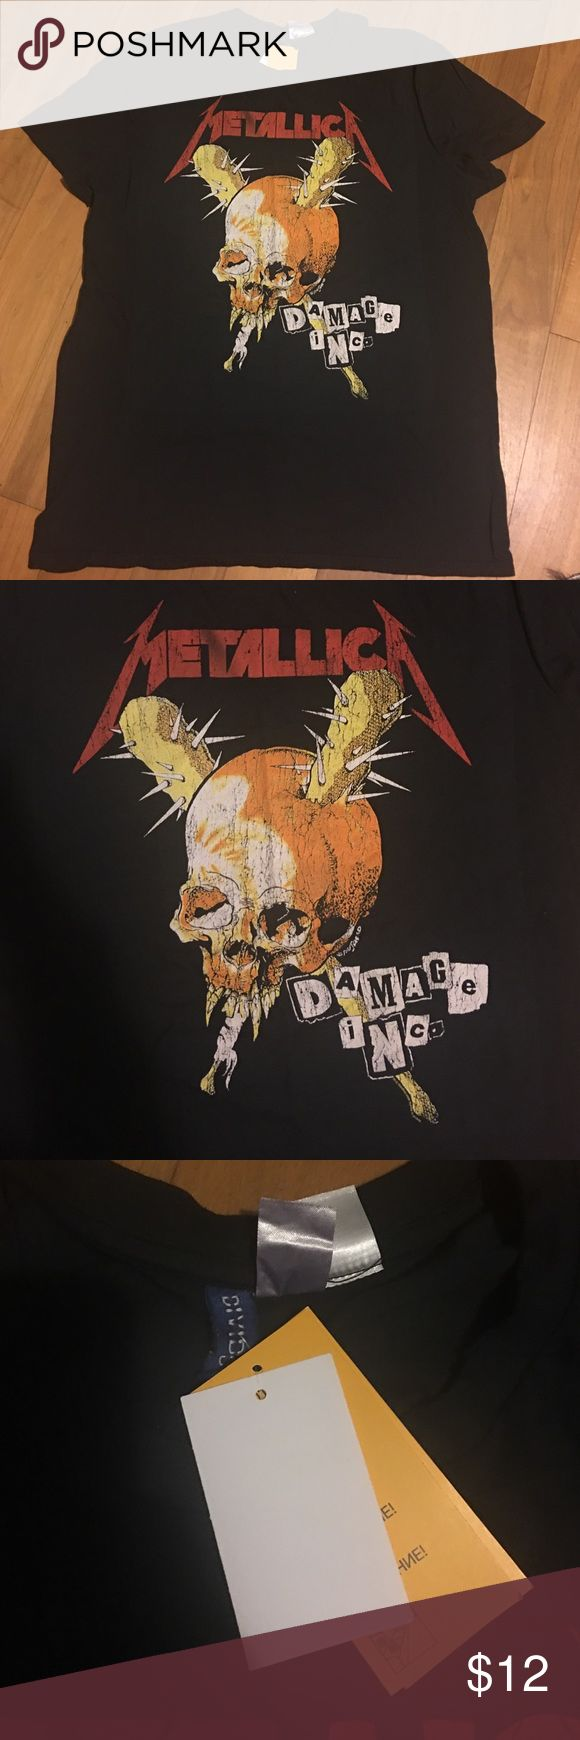 Metallica rock tee Sz xl Brand new with tags H&M Shirts Tees - Short Sleeve